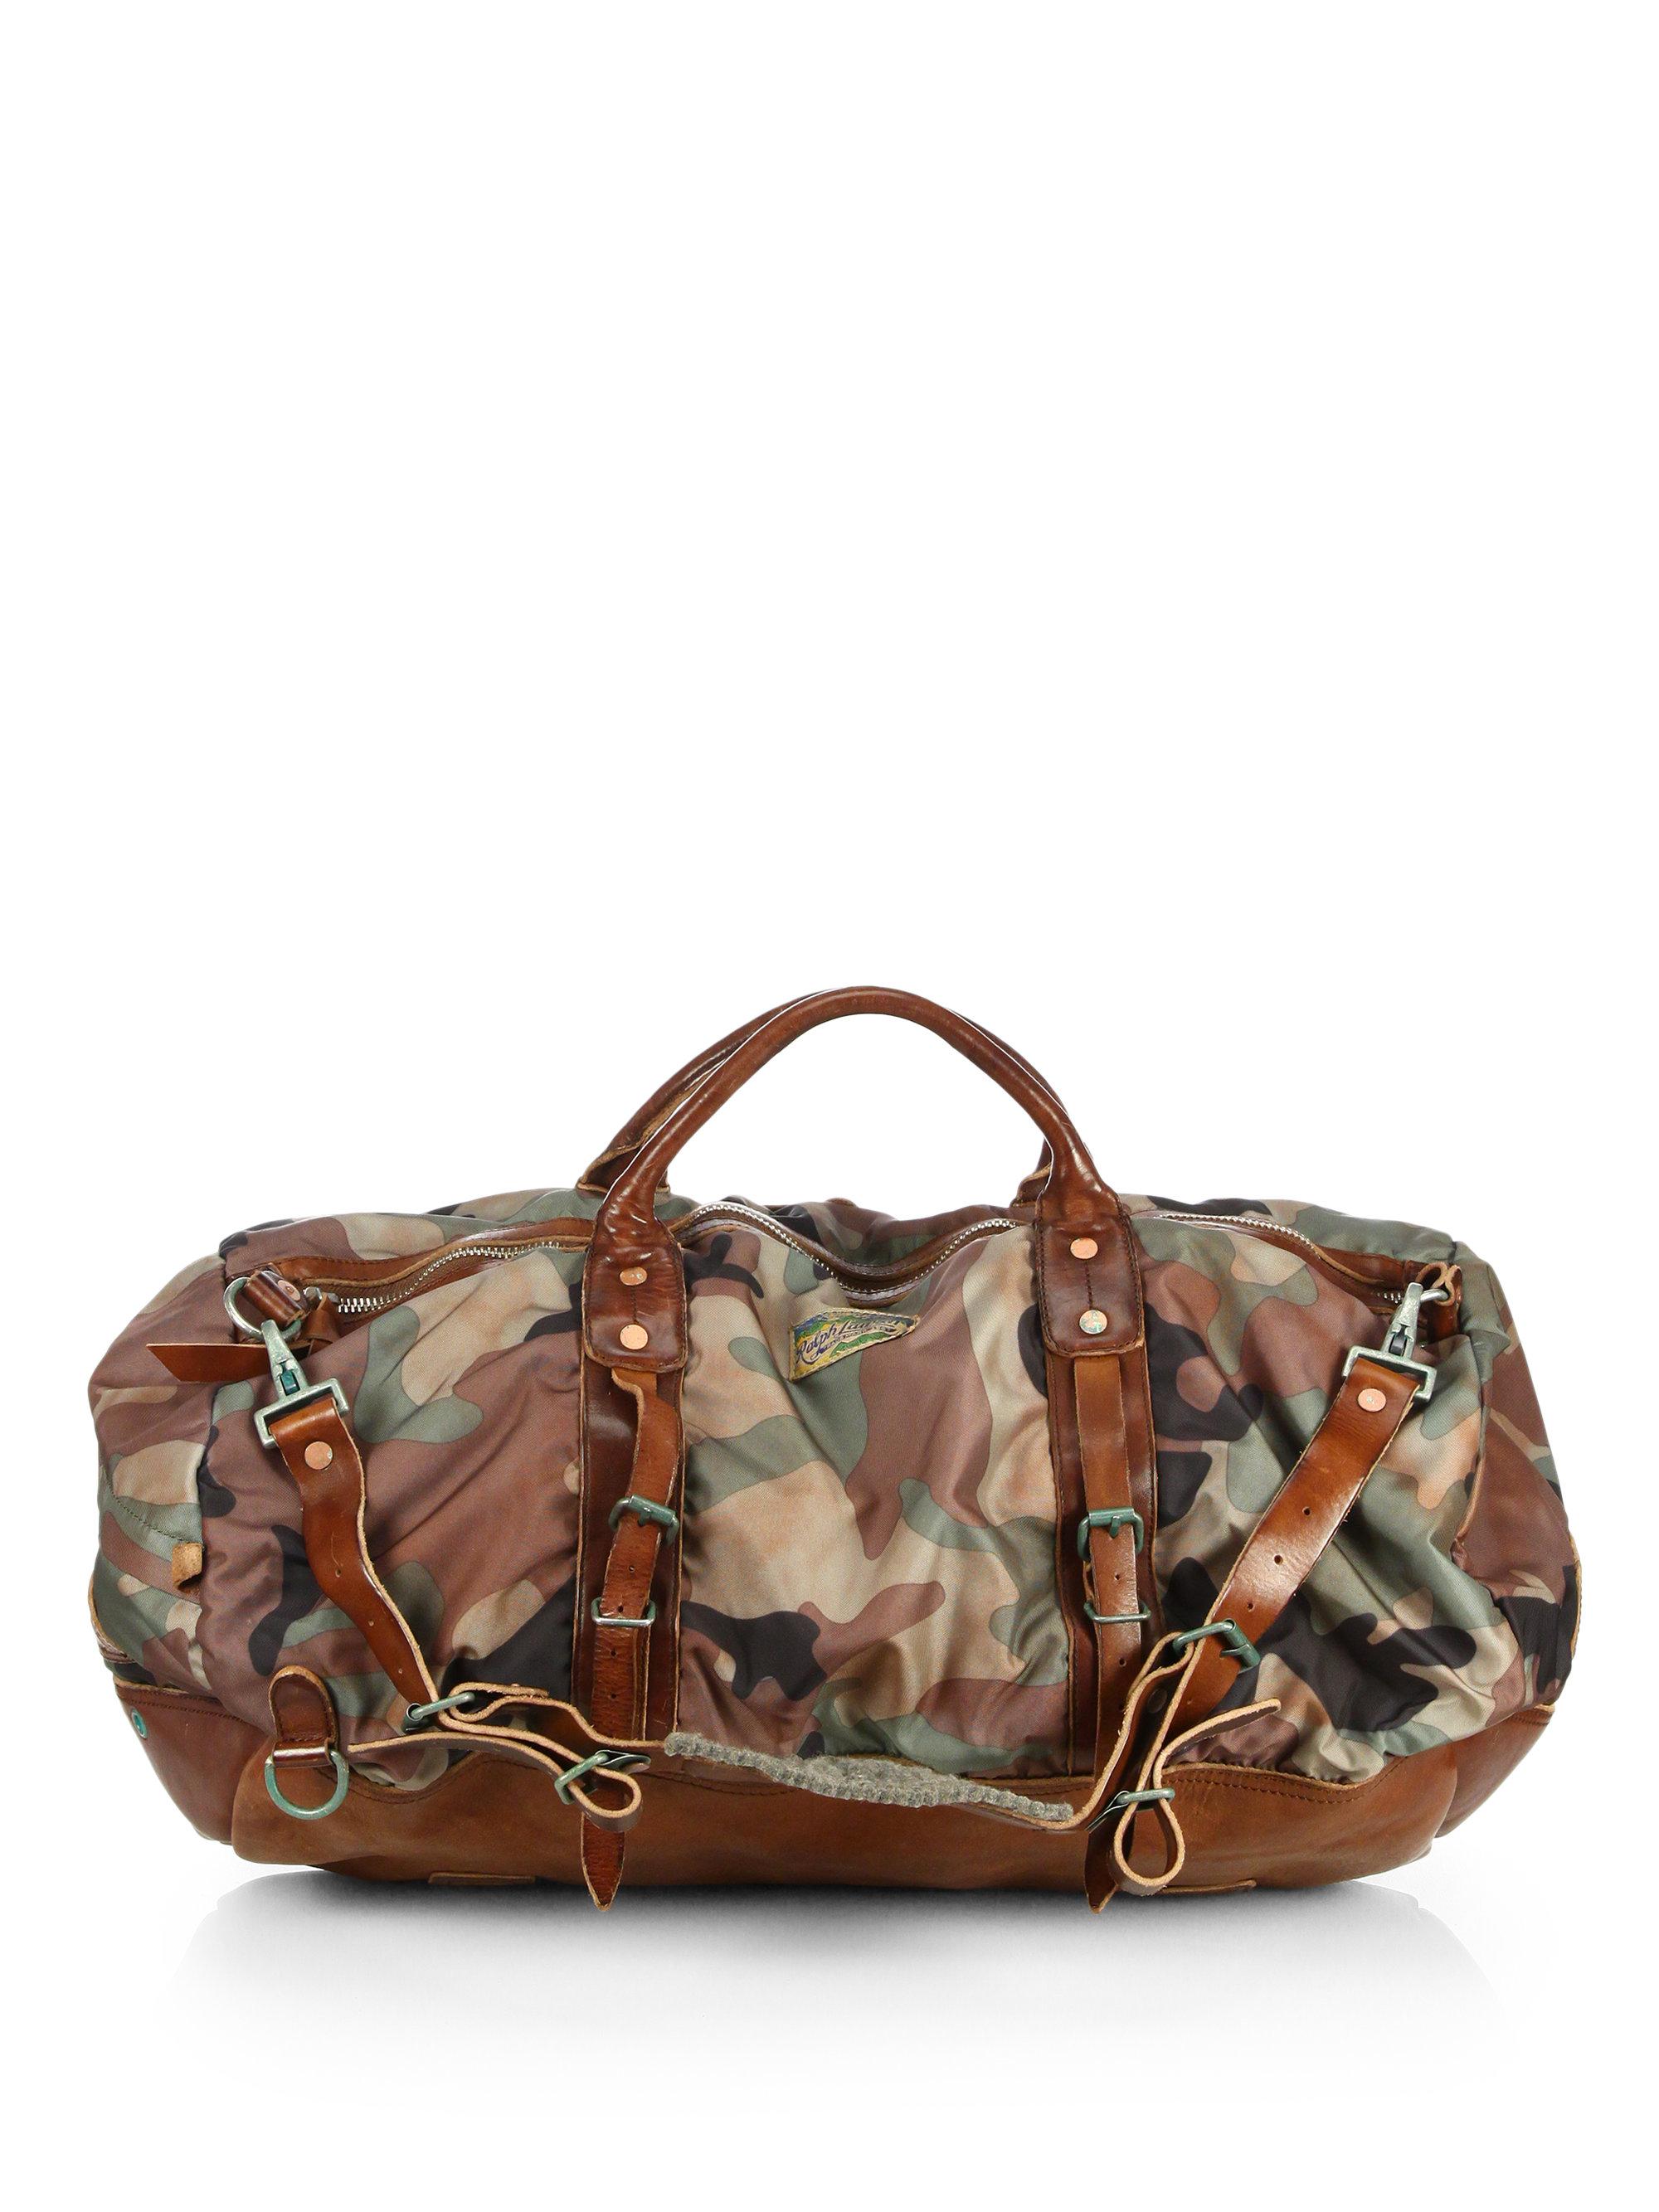 72e0dfd0b4 Lyst - Polo Ralph Lauren Yosemite Nylon Duffel Bag in Green for Men